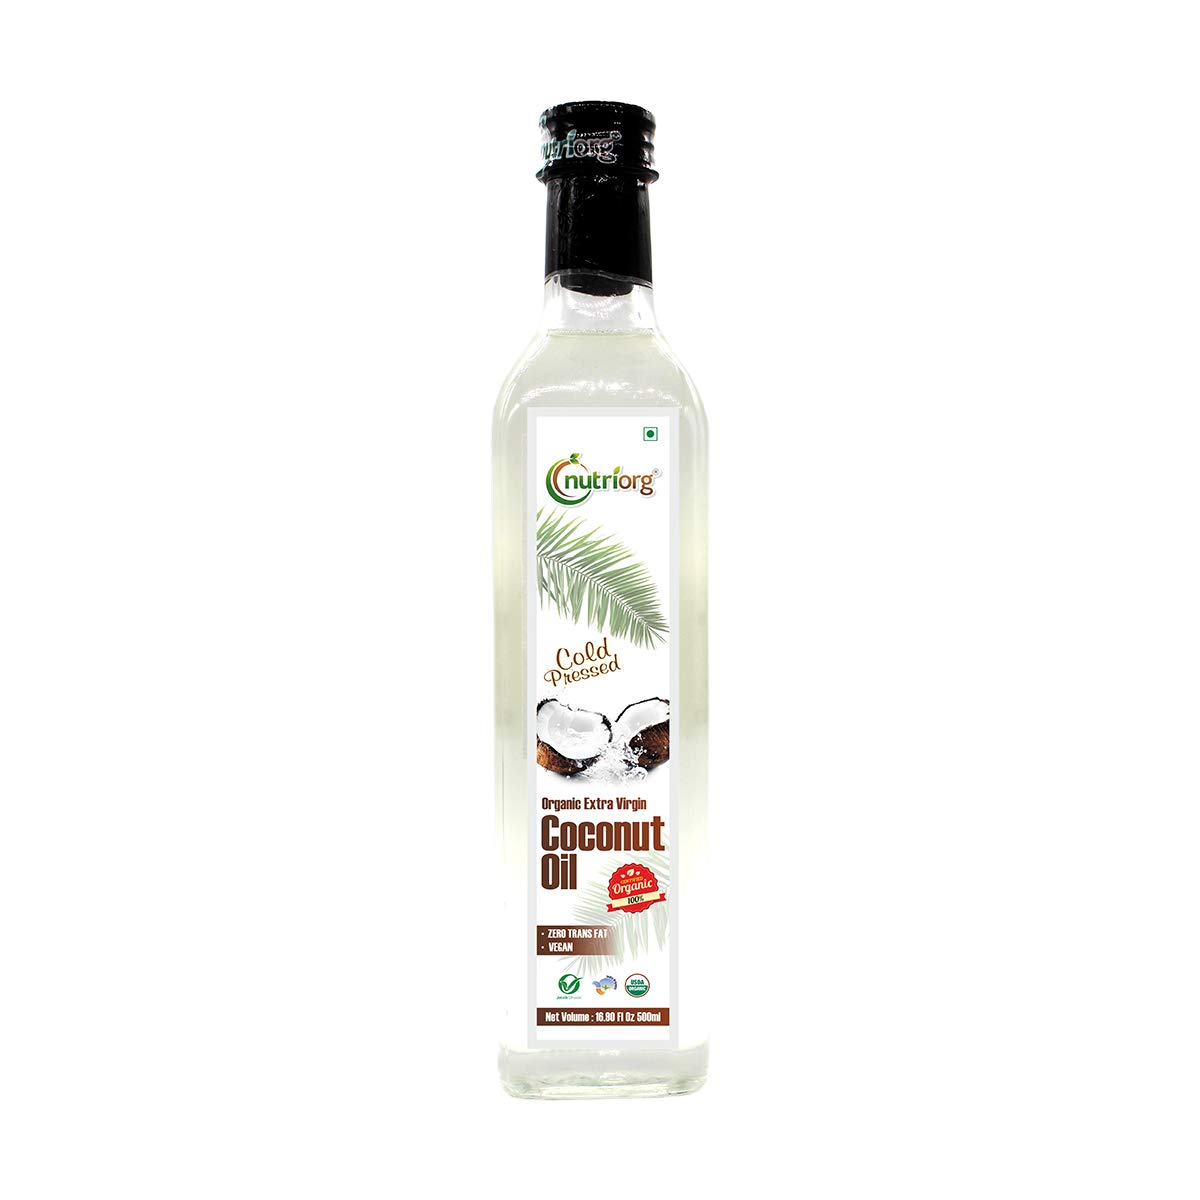 Nutriorg 100% Organic Virgin Coconut Oil   16.9 Fl. Oz   Unrefined Cold Pressed Plant Based Oil   for Cooking, Hair and Skin   Pure USDA Organic Non-GMO